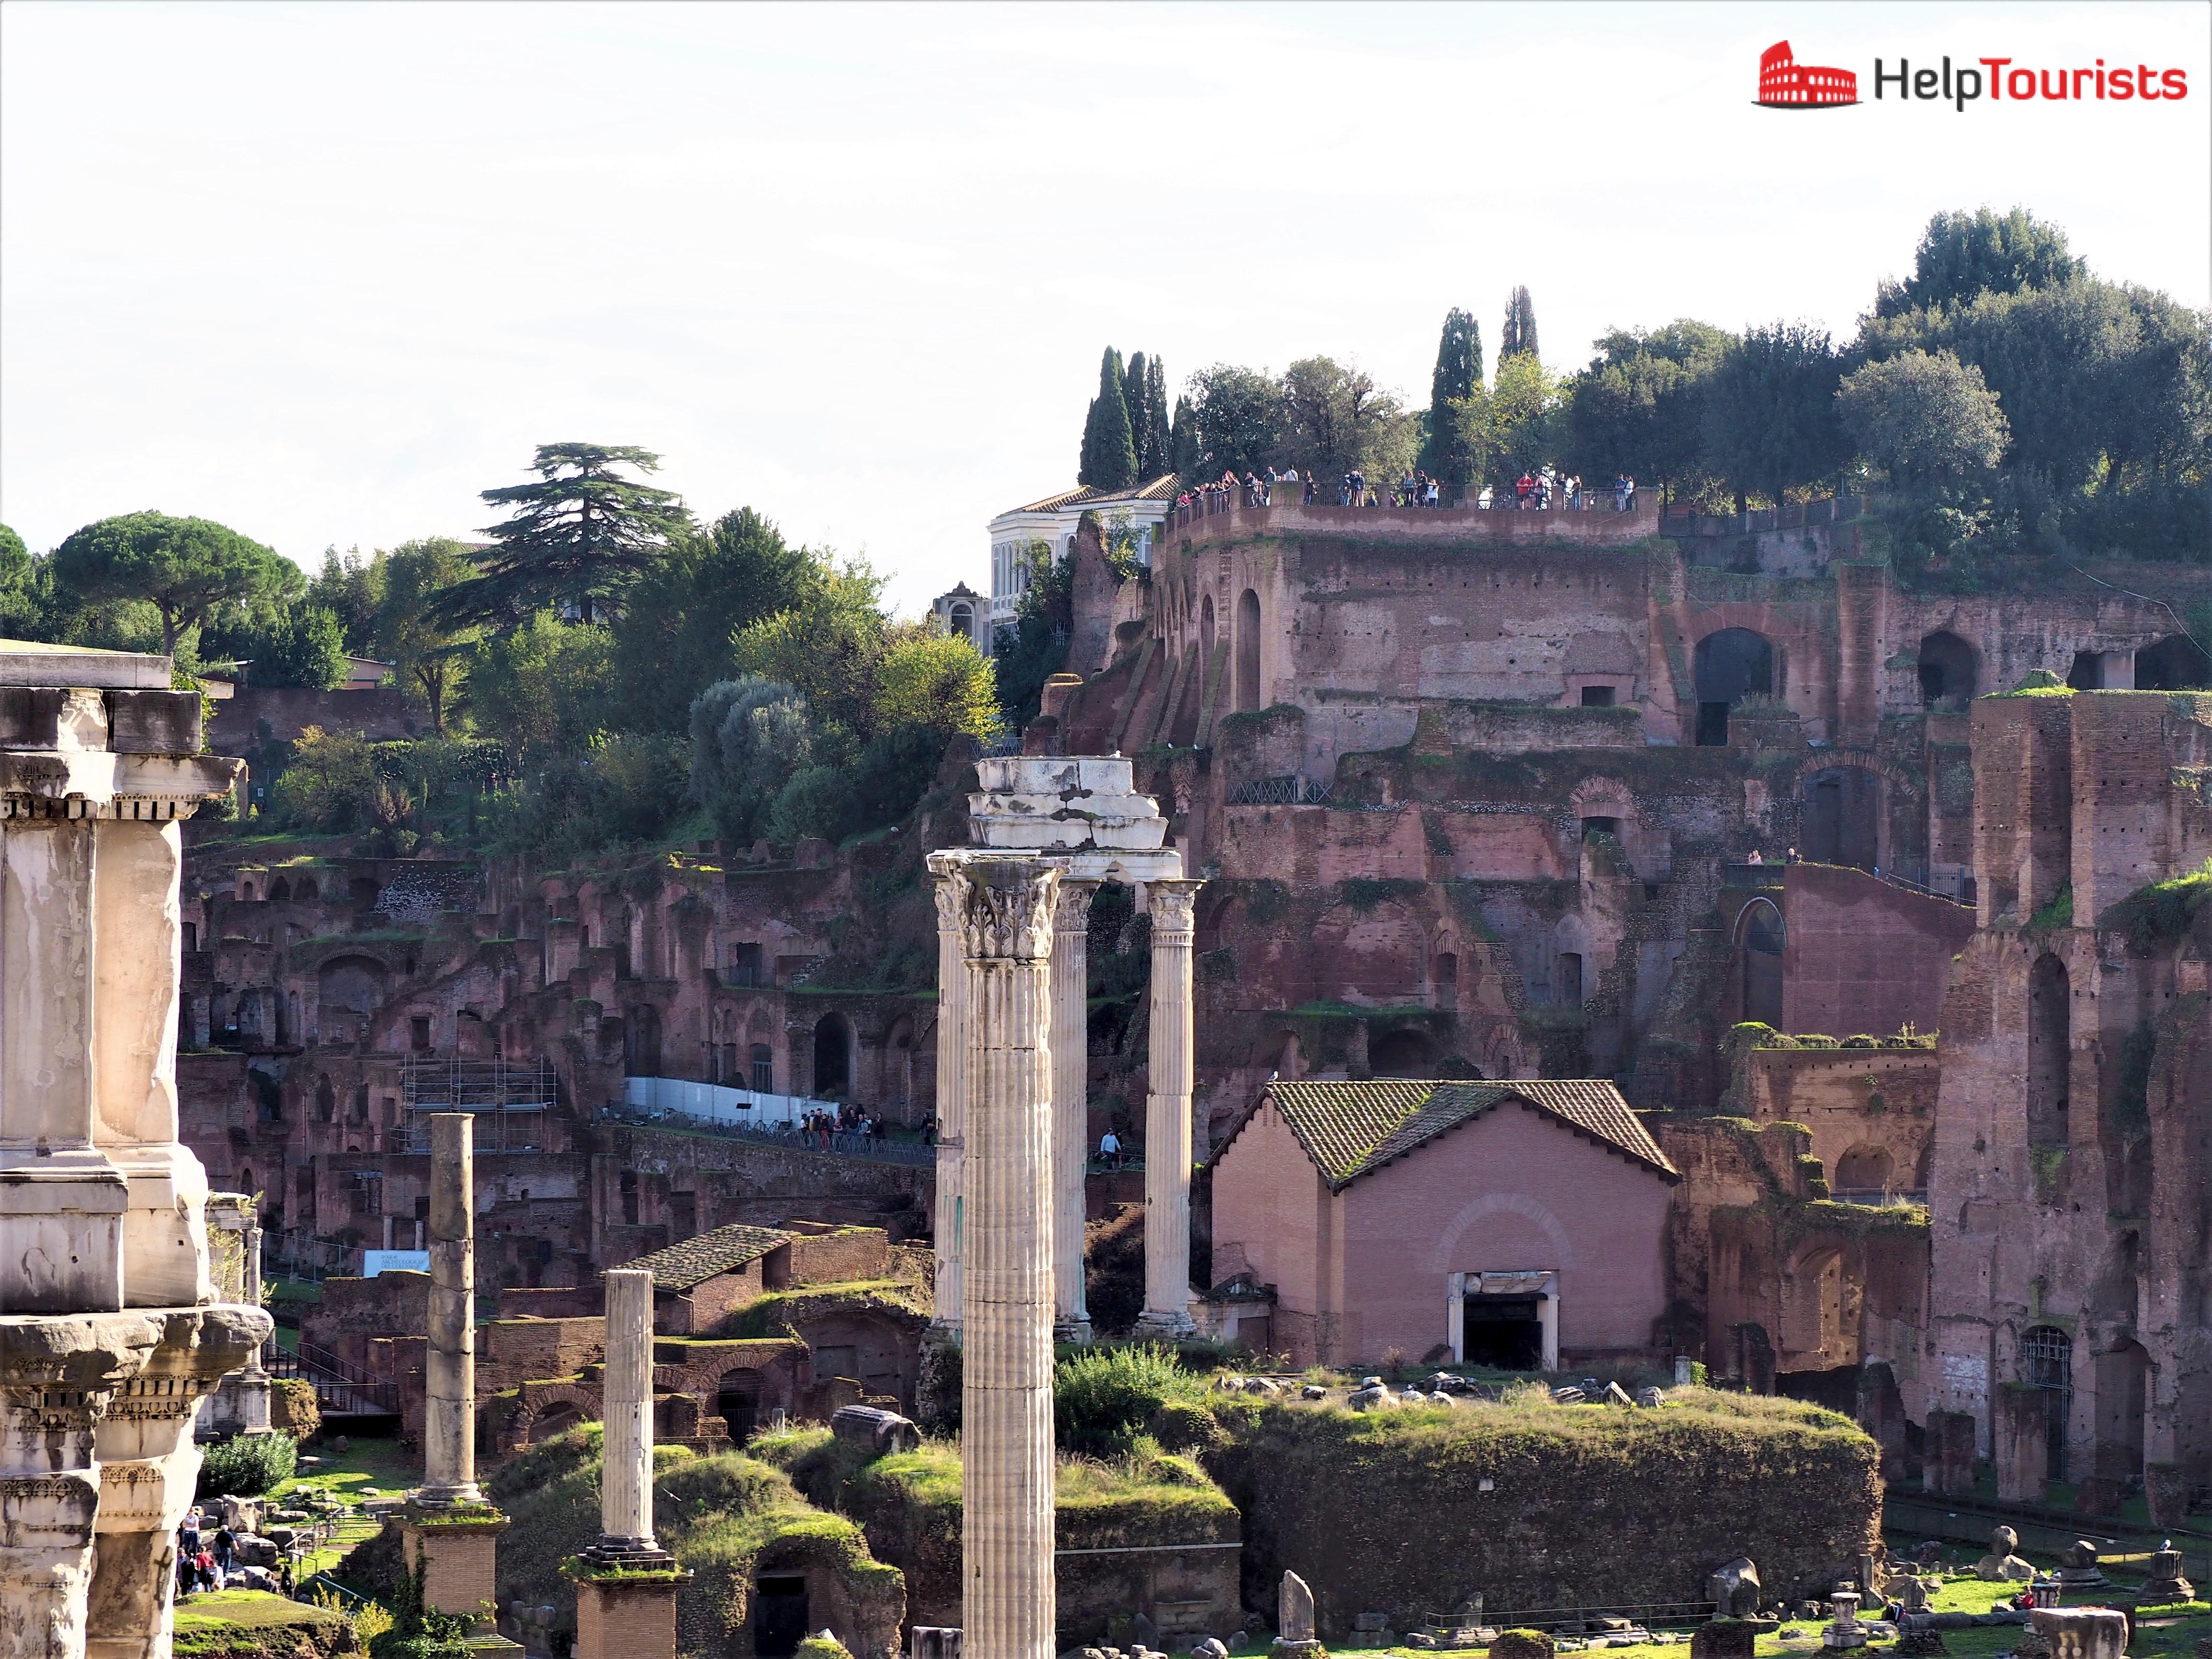 Rom 7 Hügel Palatin vom Kap. aus